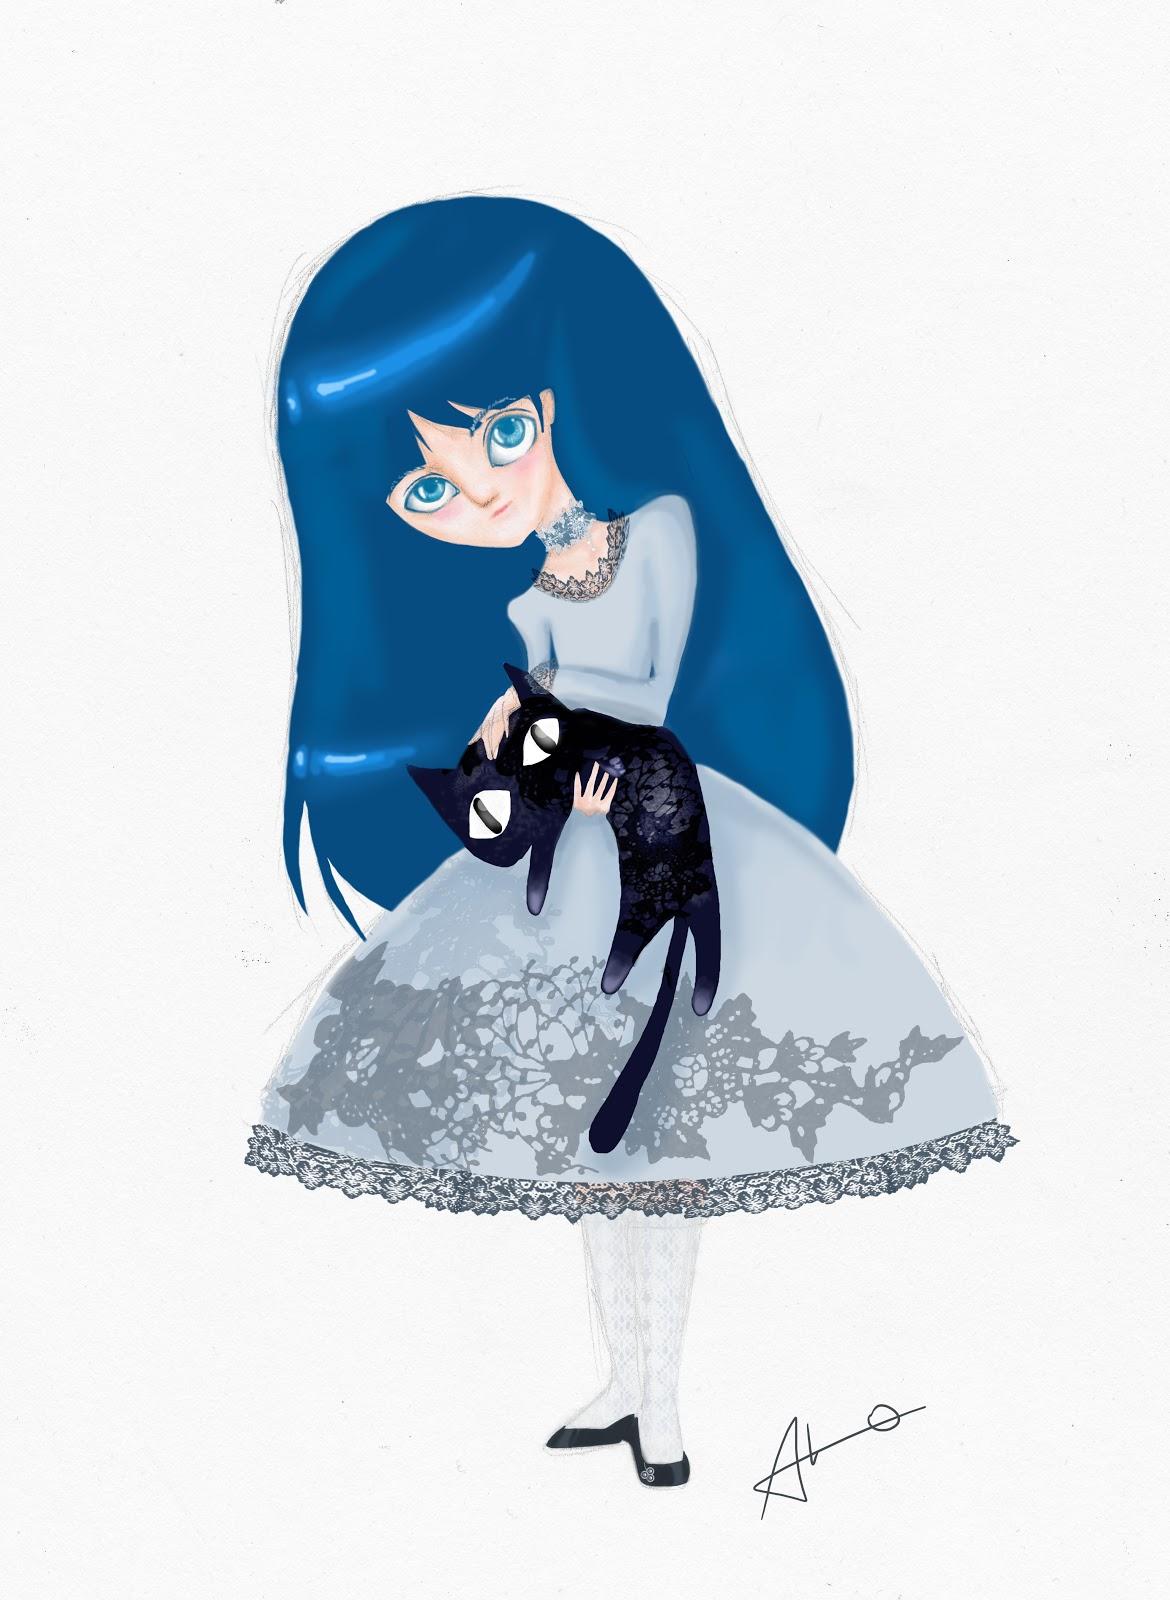 http://1.bp.blogspot.com/_JYcayusYi_c/TUgxxJiItgI/AAAAAAAAAAM/zvwc46wyELY/s1600/la+fille+bleue+copie.jpg